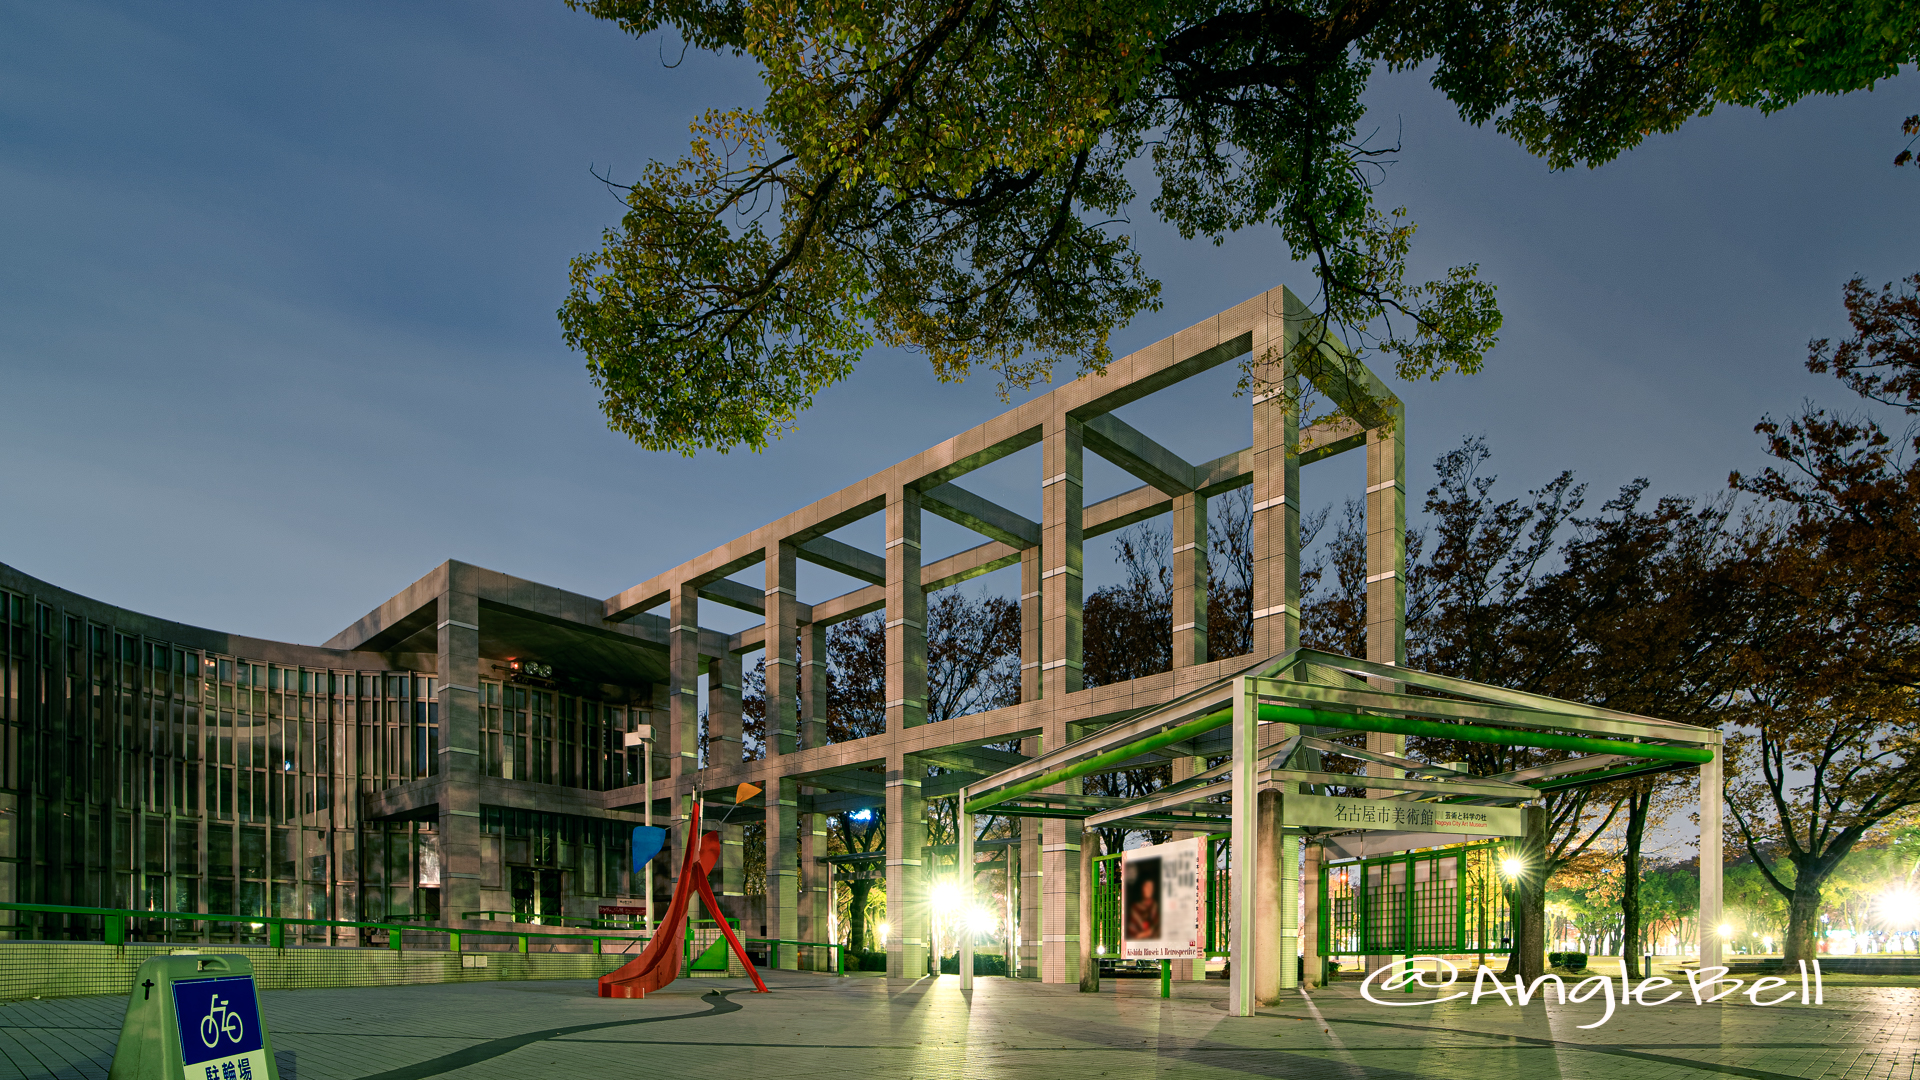 夜景 名古屋市美術館 芸術と科学の杜 2019年冬